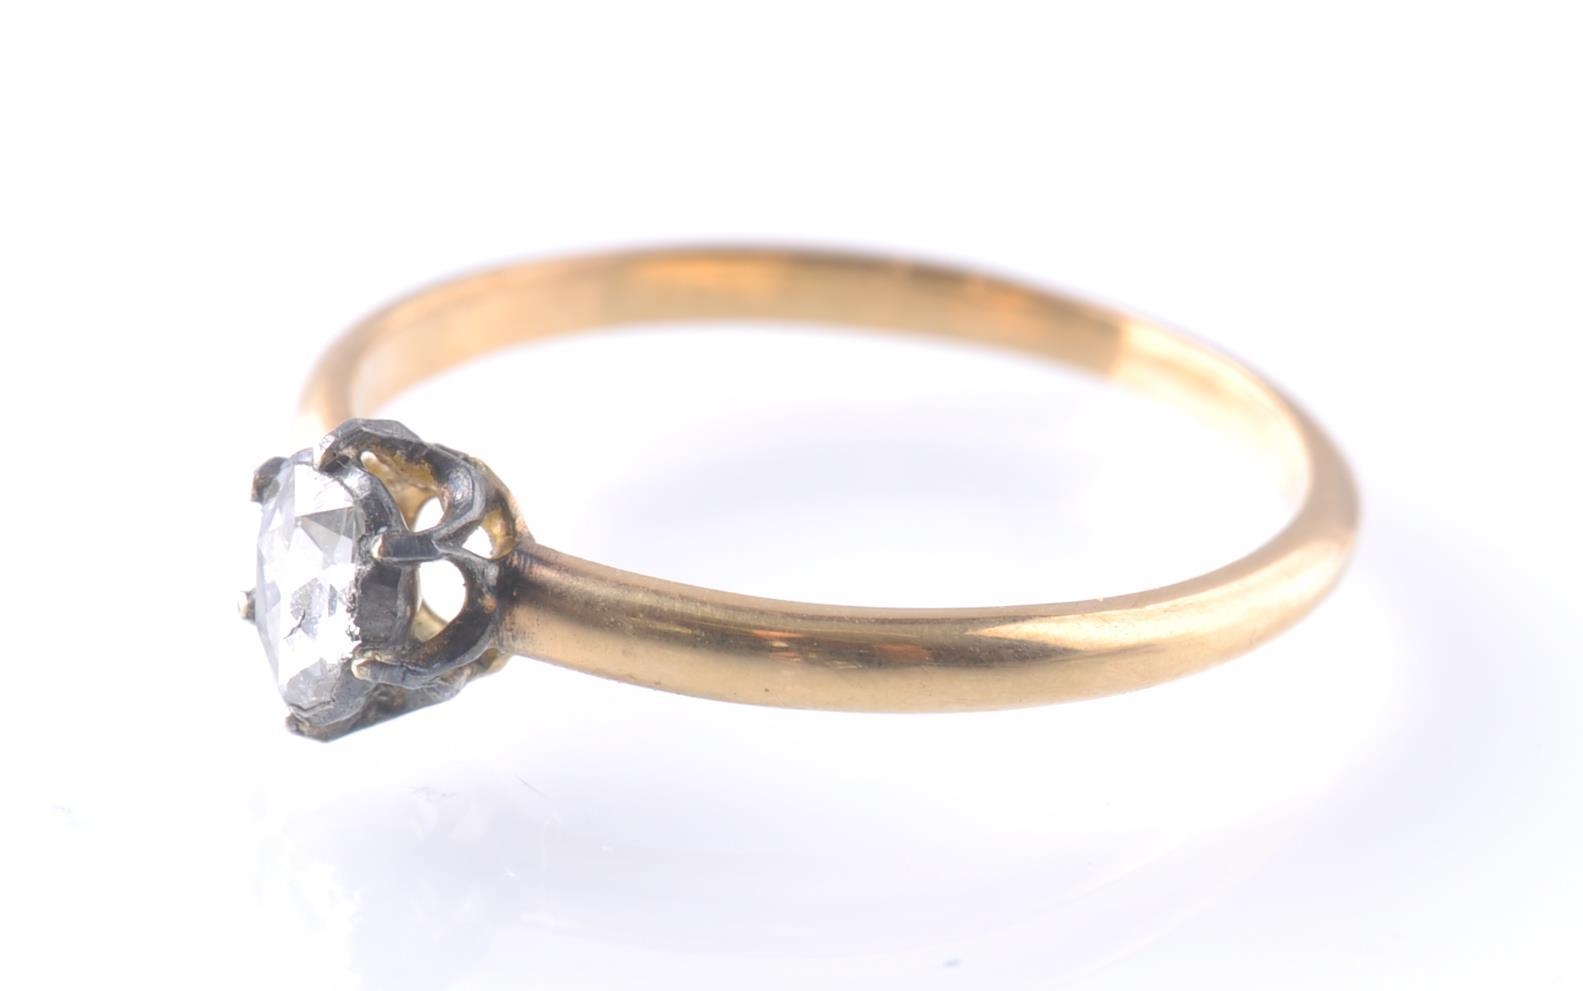 19TH CENTURY ANTIQUE ROSE GOLD SINGLE STONE DIAMON - Image 2 of 3